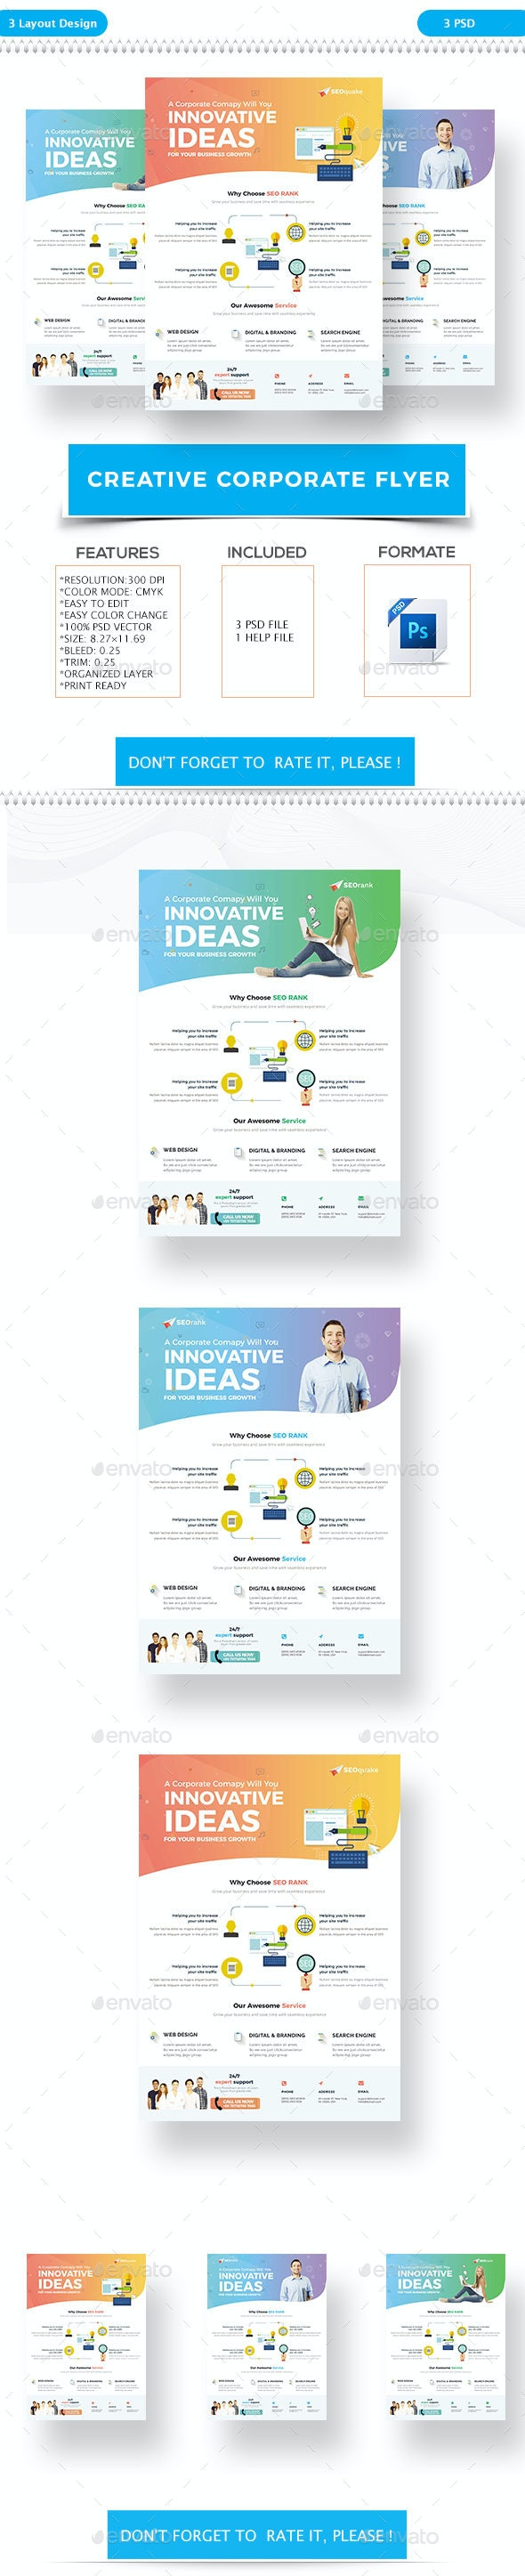 Creative Corporate Flyer - Flyers Print Templates